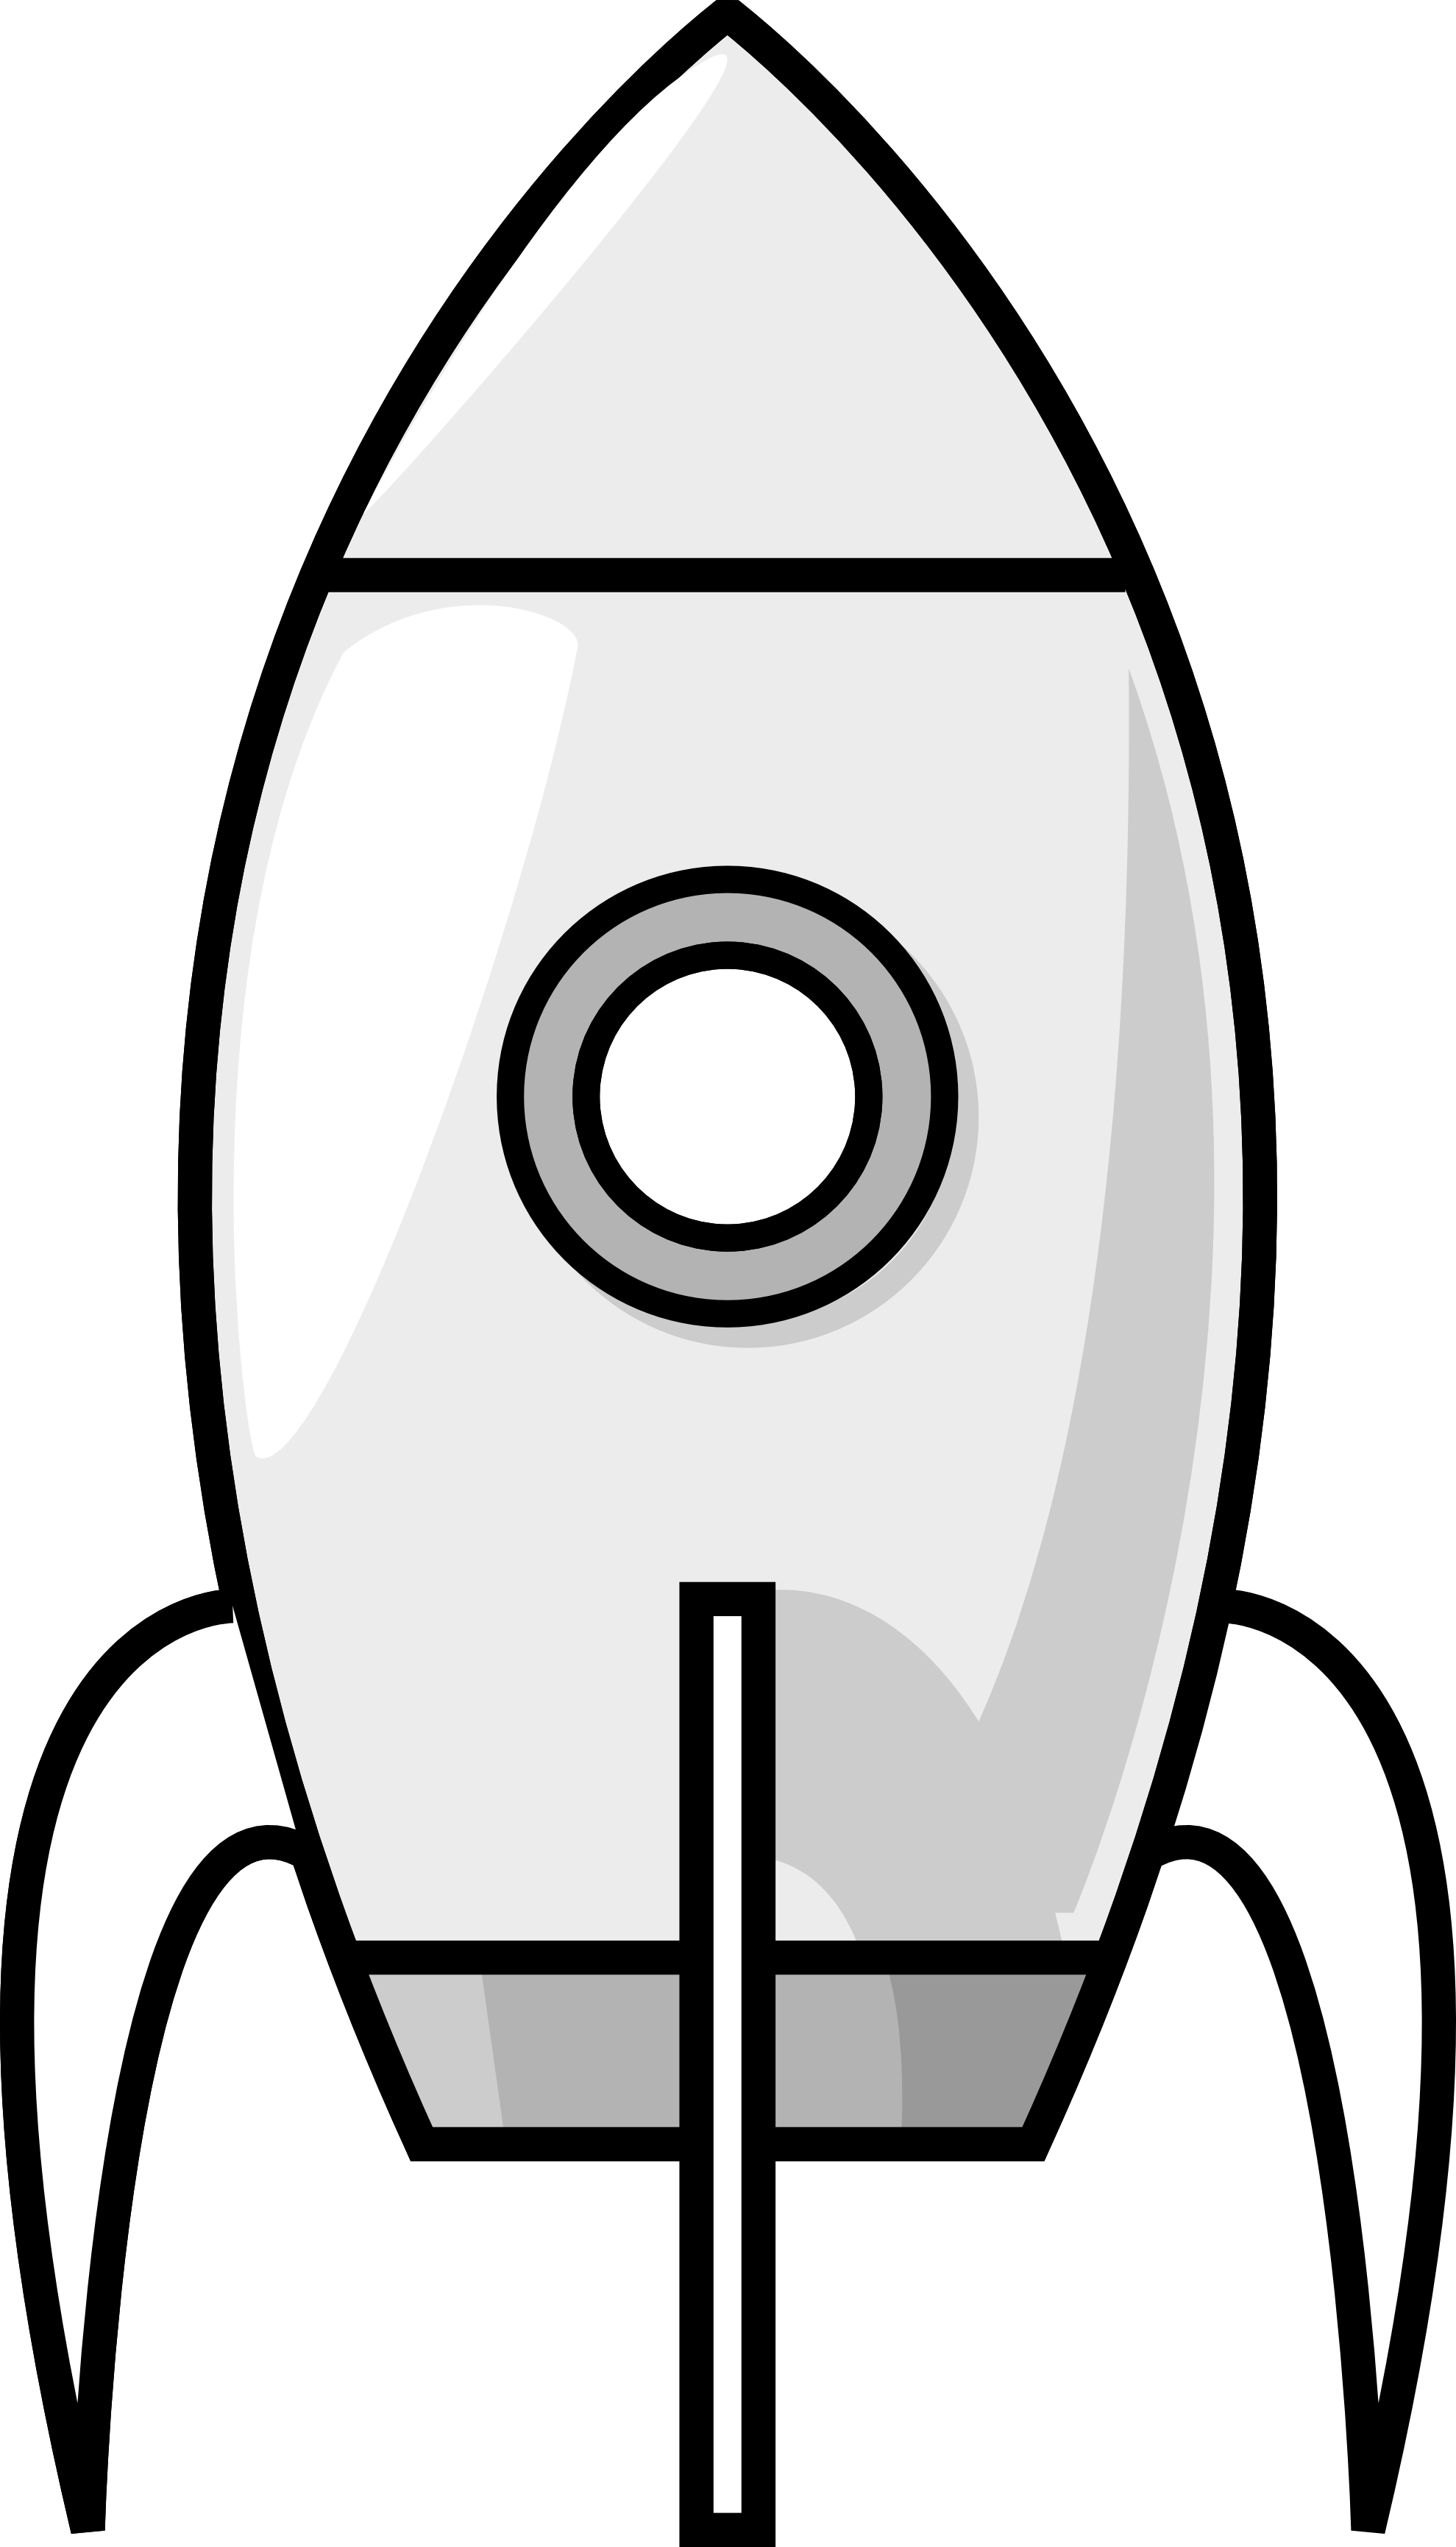 Rocketship clipart space craft. Spaceship ship clip art